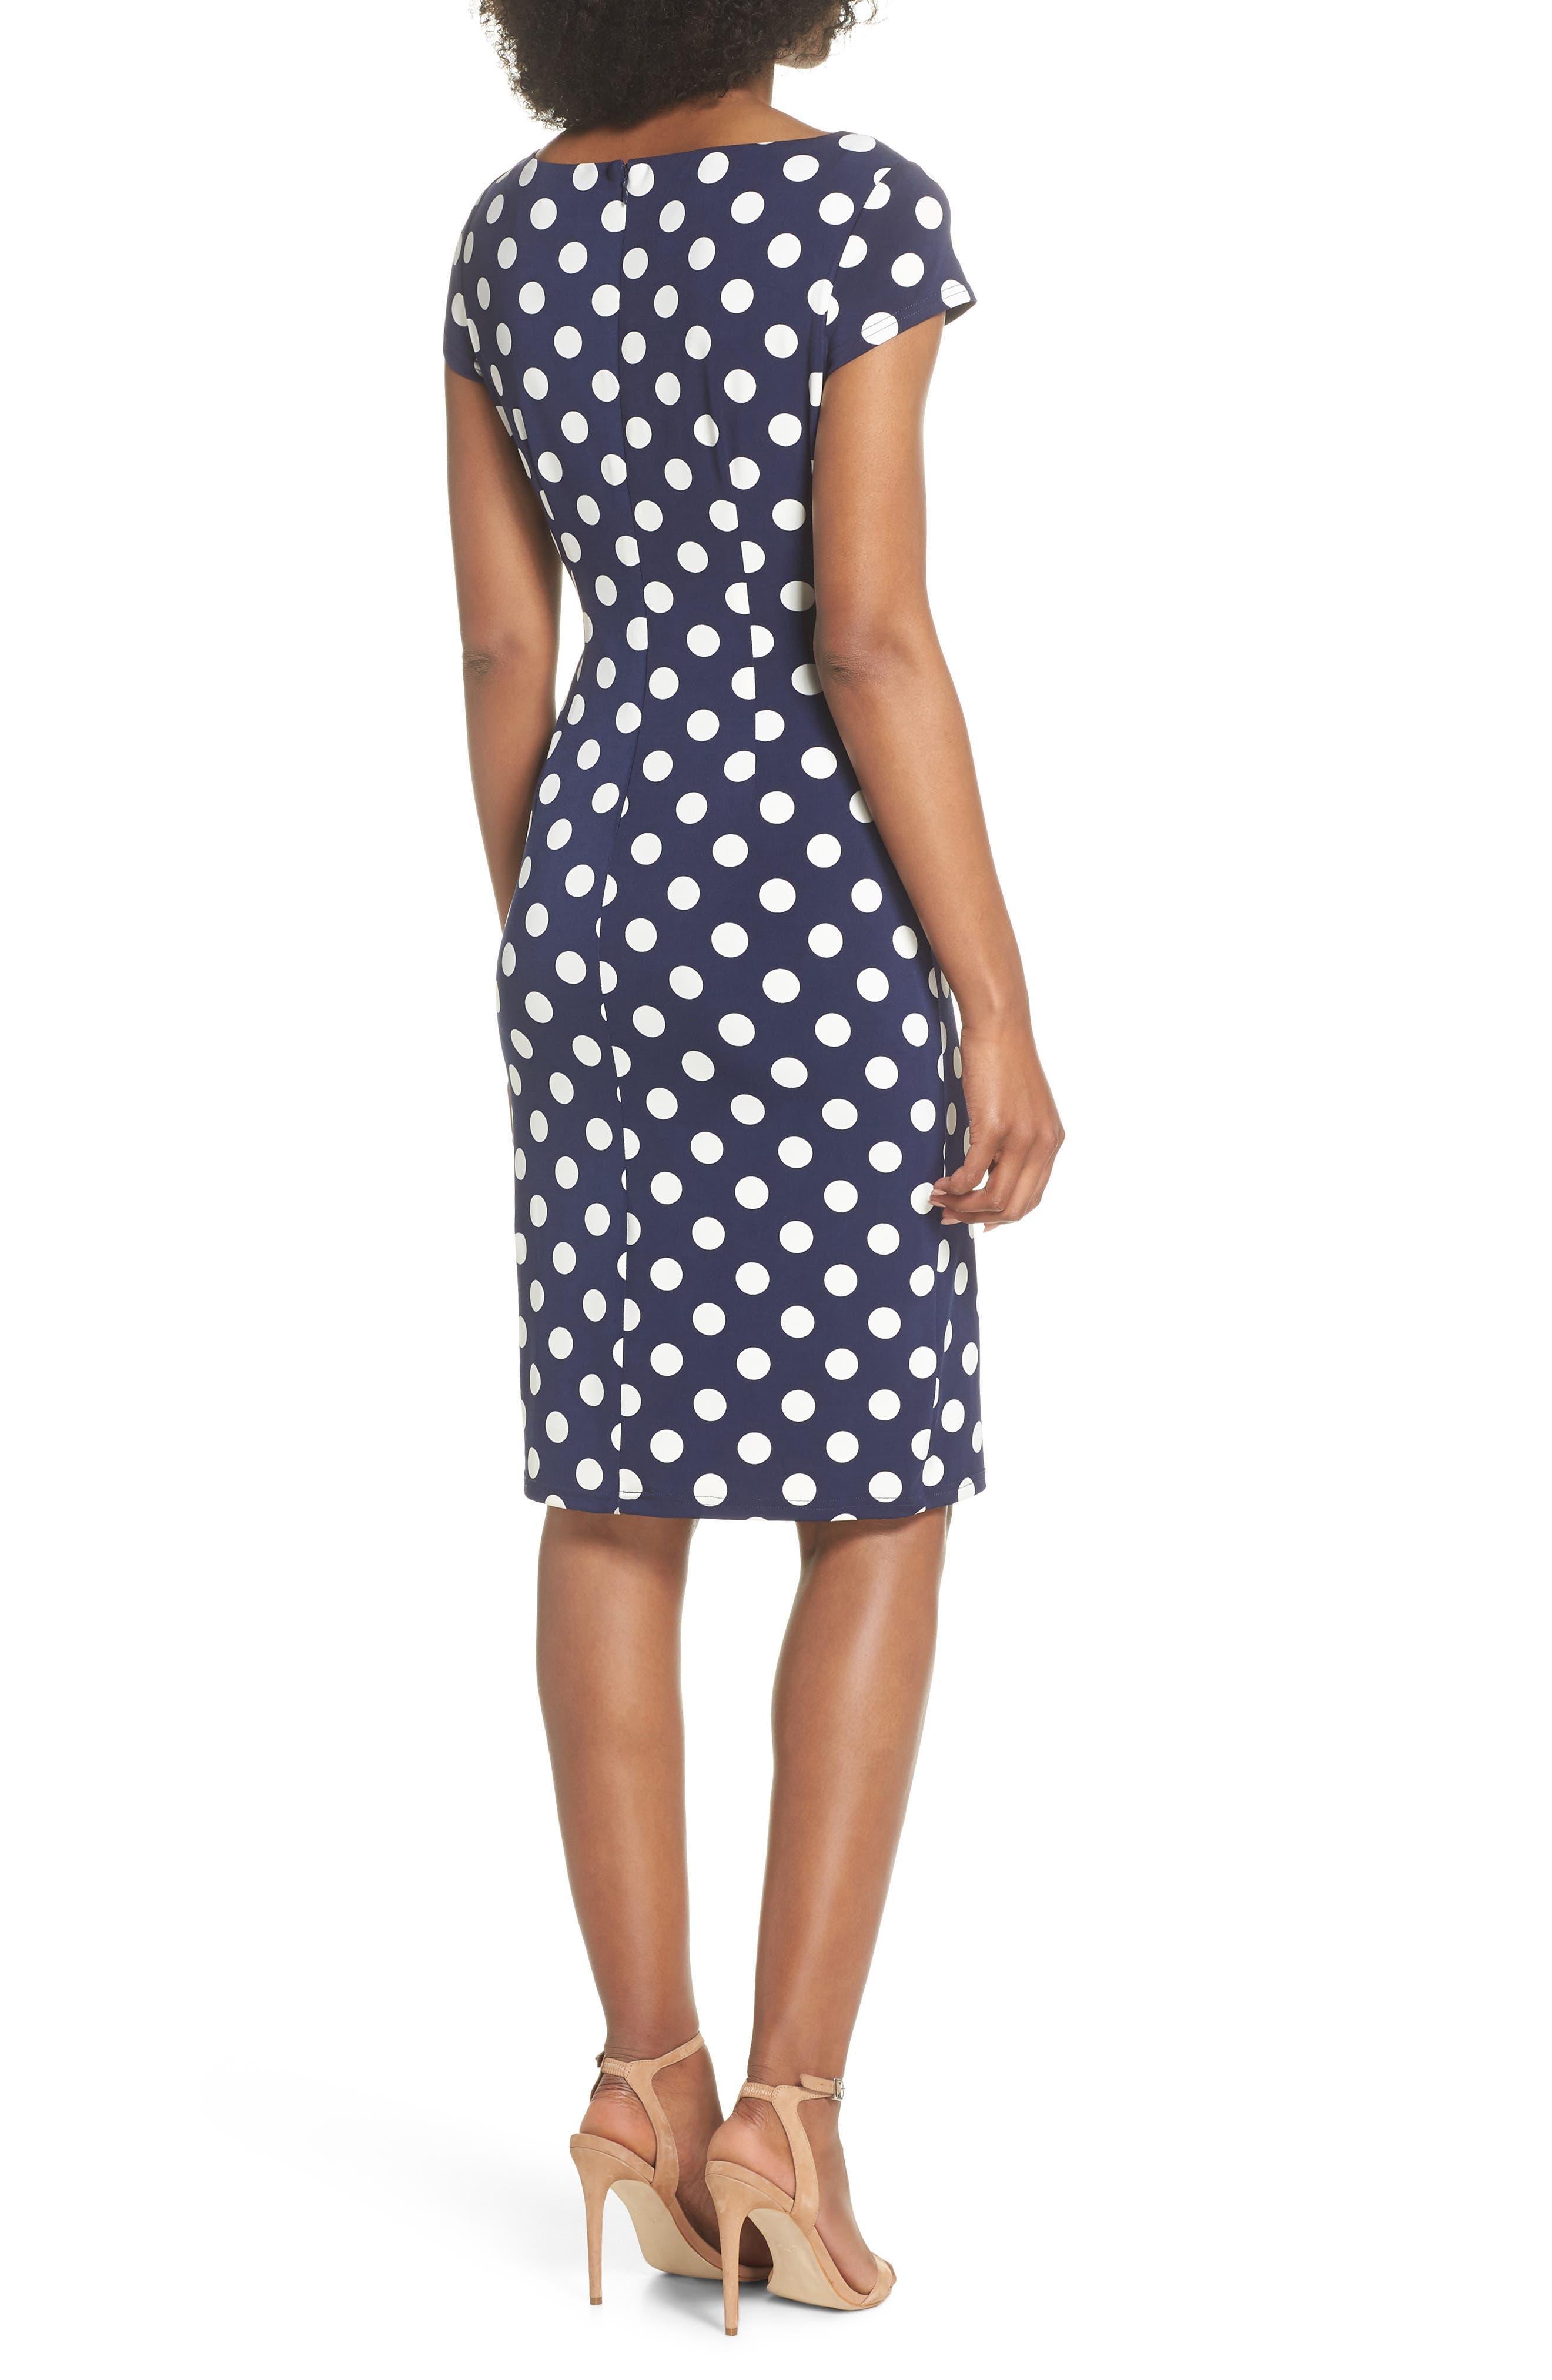 ELIZA J, Polka Dot Side Twist Sheath Dress, Alternate thumbnail 2, color, 407